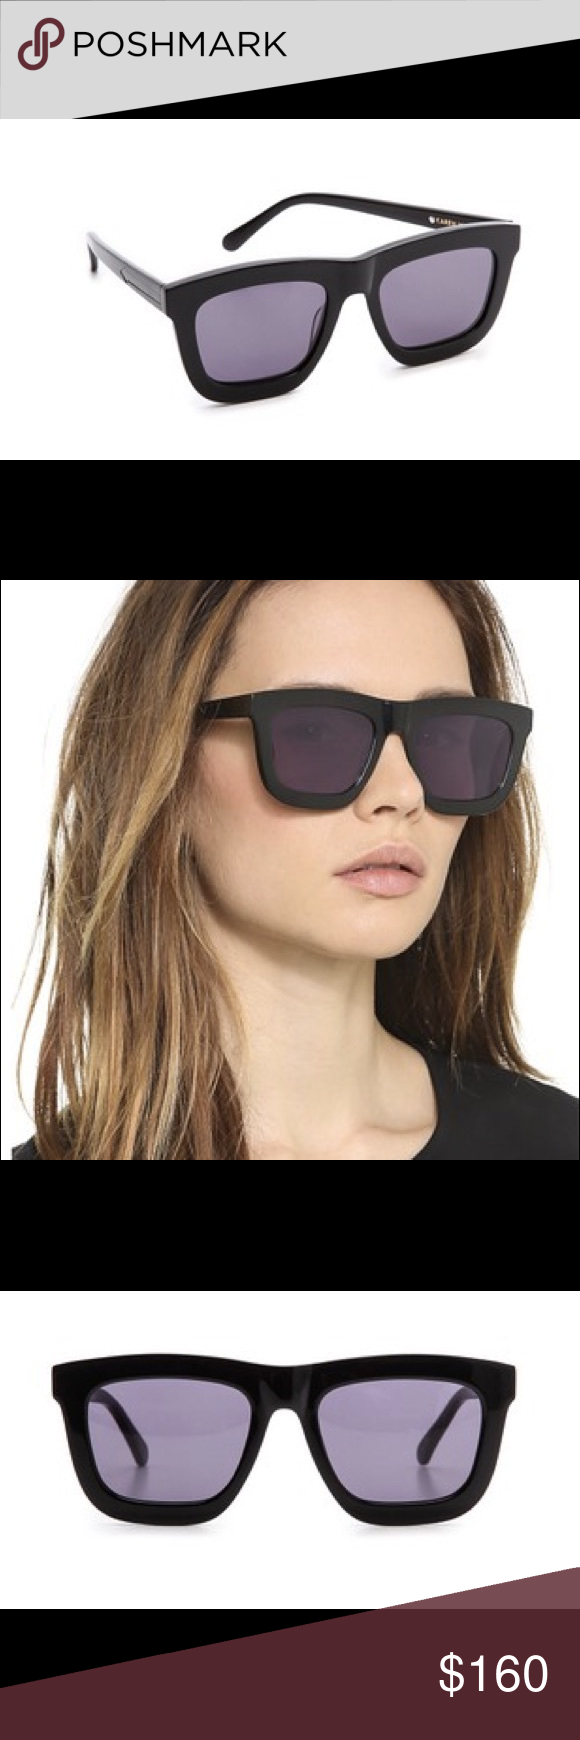 9f95e9996f7f Color  black grey smoke mono. Measurements  width 6in 15cm. Height   2.25in 5.5cm. Lens width  50mm Karen Walker Accessories Sunglasses